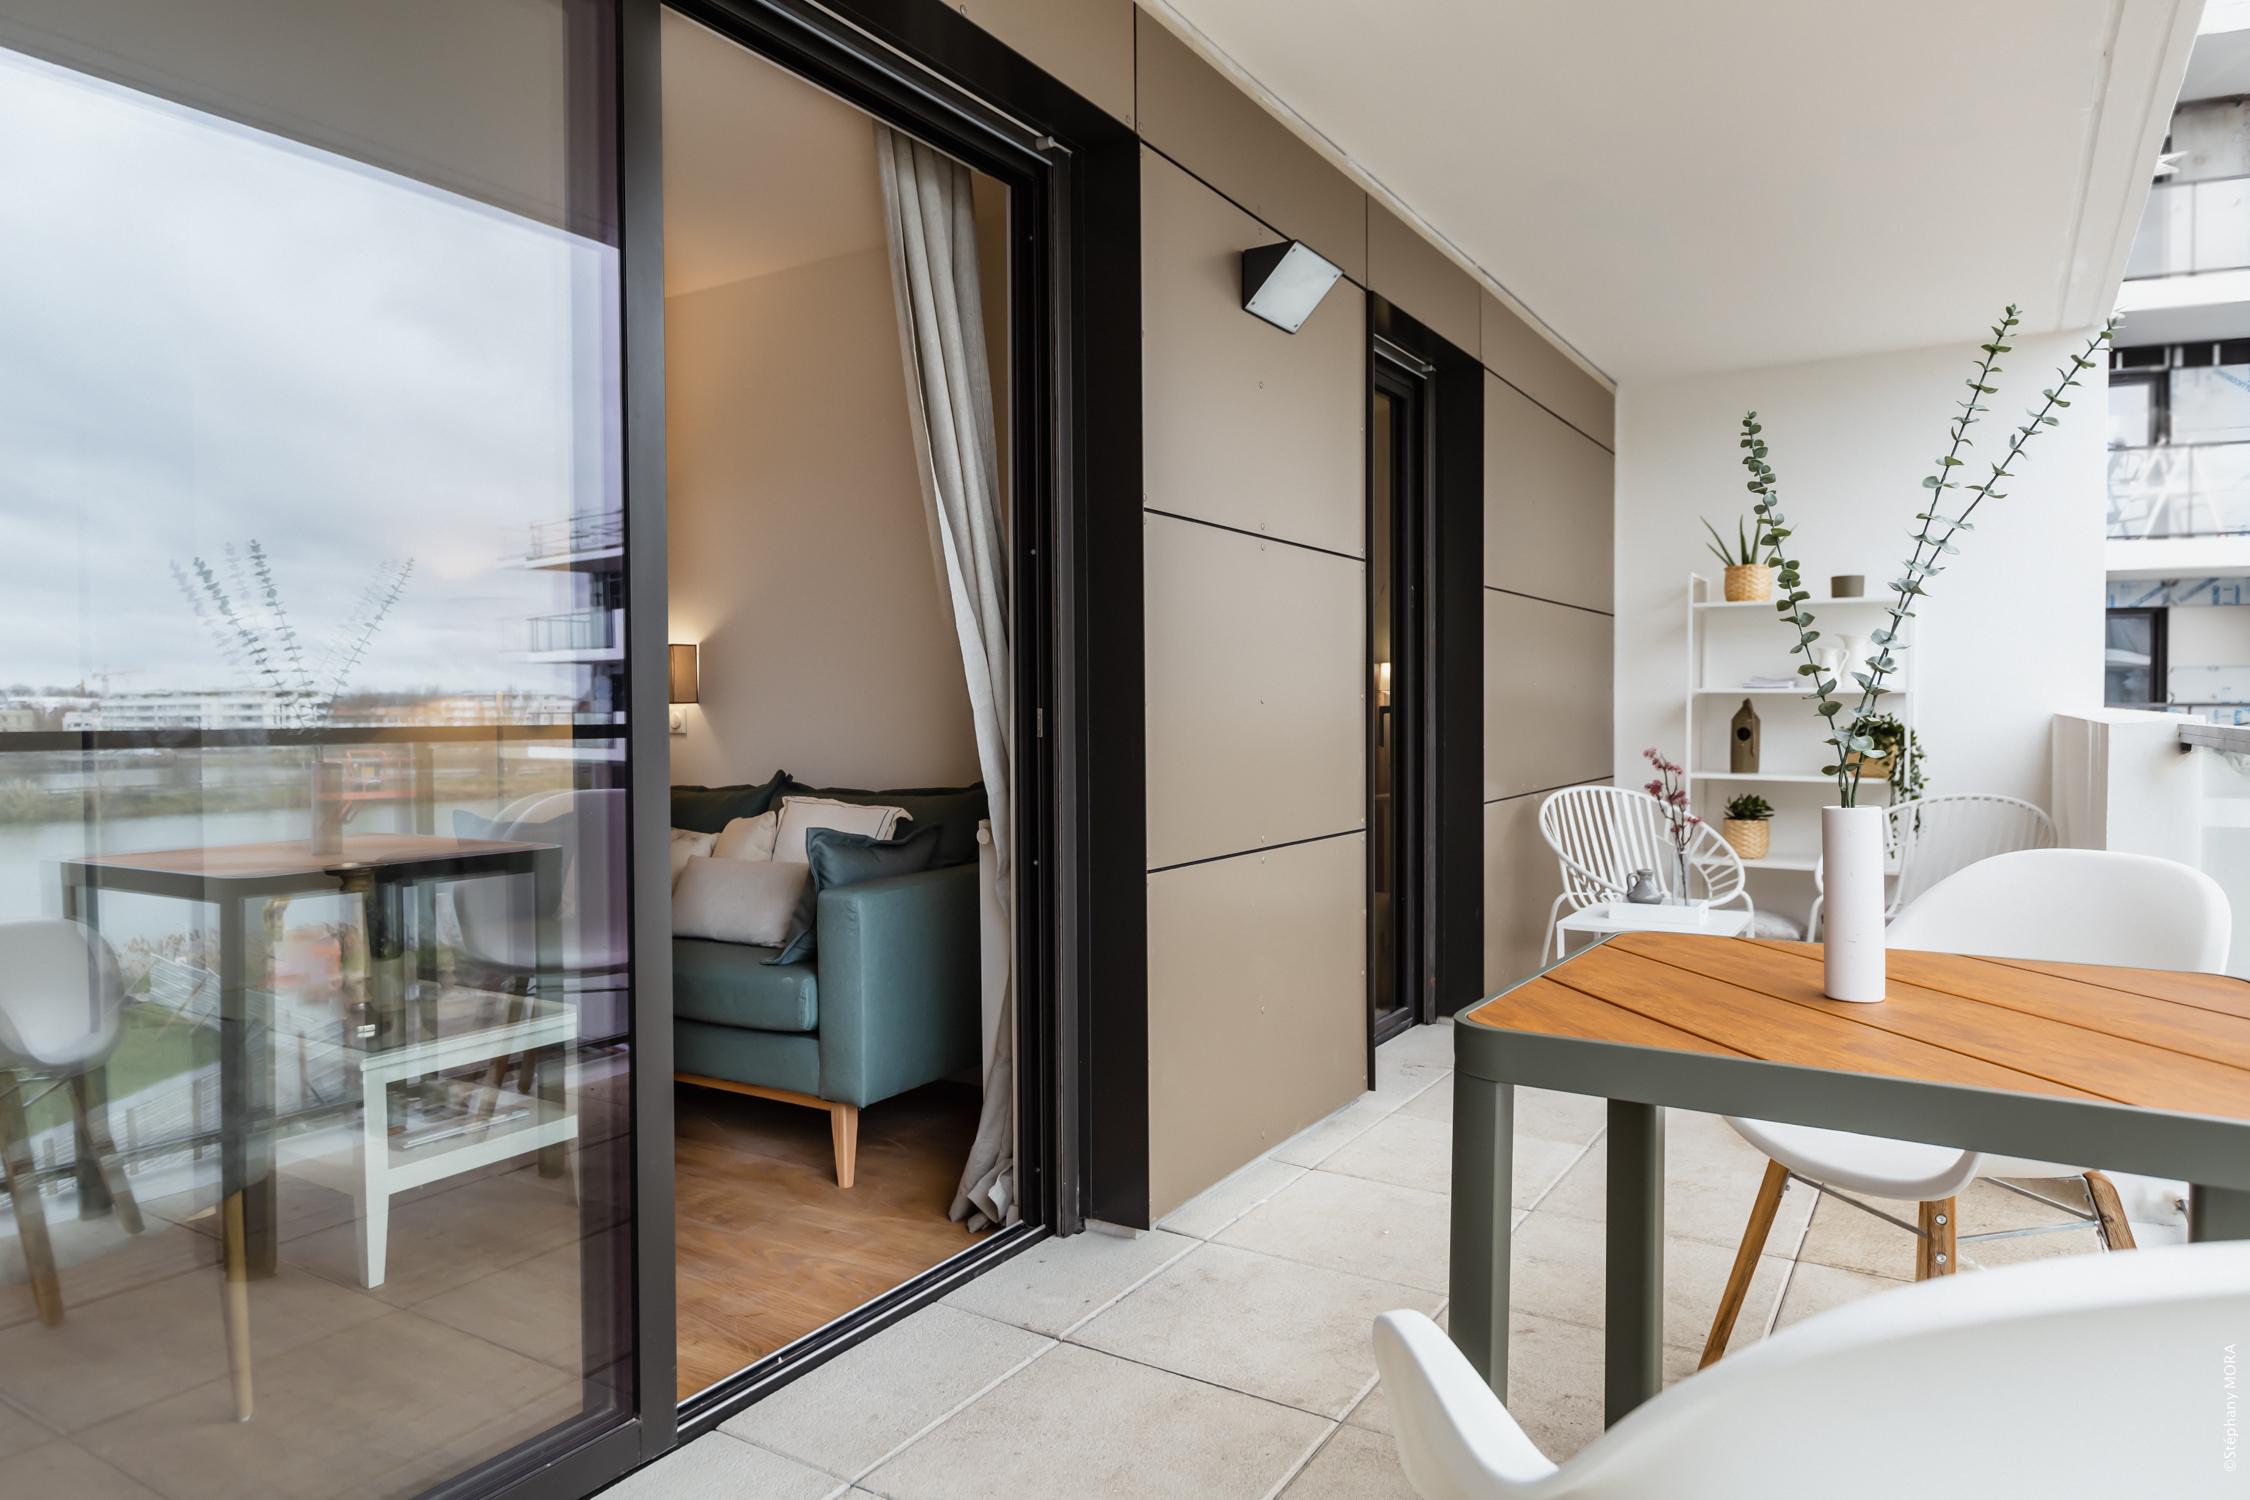 Programme immobilier neuf VIVALYS - résidence séniors